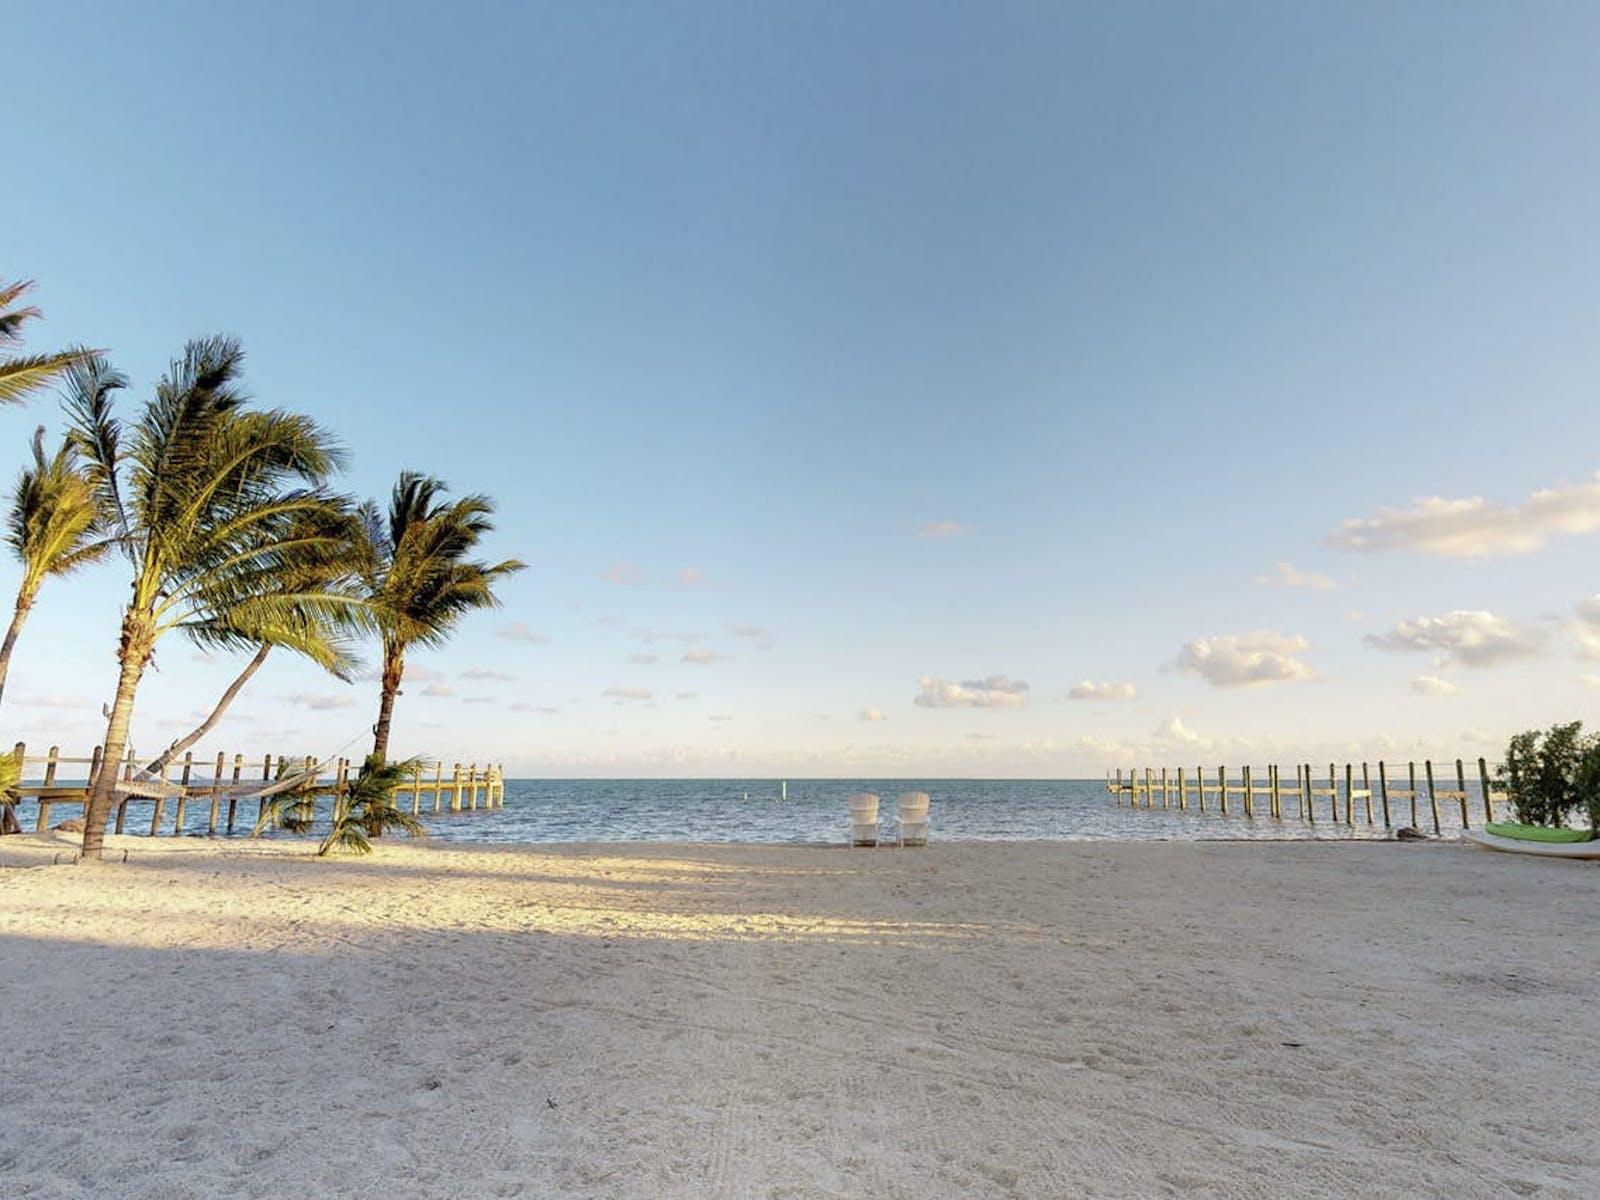 Beautiful sandy beach in Islamorada, Florida